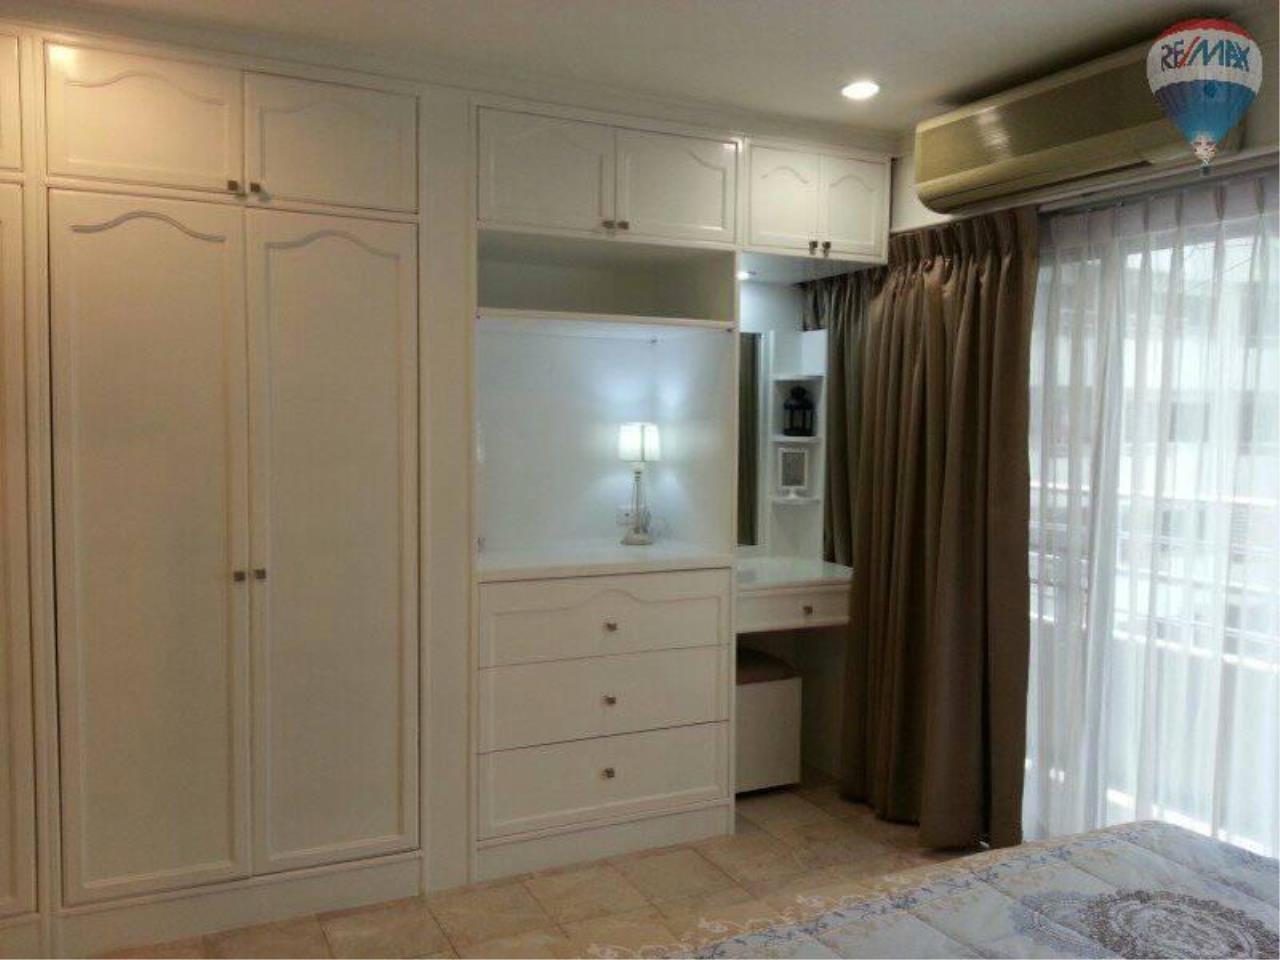 RE/MAX Properties Agency's 1 Bedroom 60 Sq.m for RENT at Saranjai Mansion,Sukhumvit Soi 4 (Nana) 6